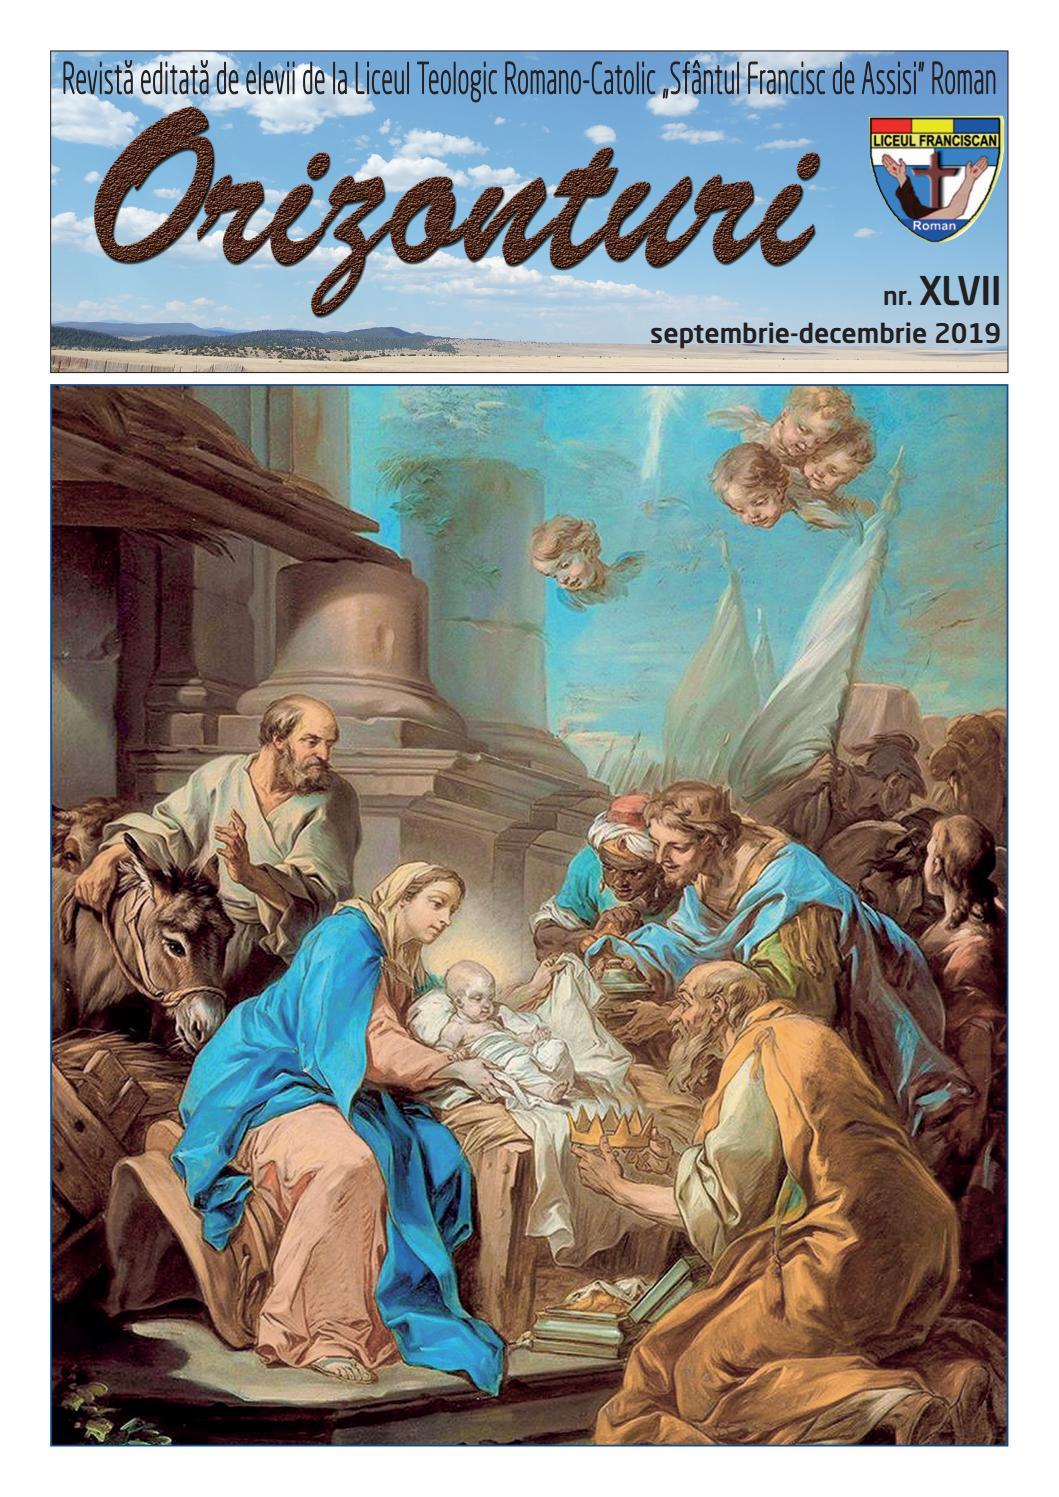 Intalnirea femeii practiciene catolice)